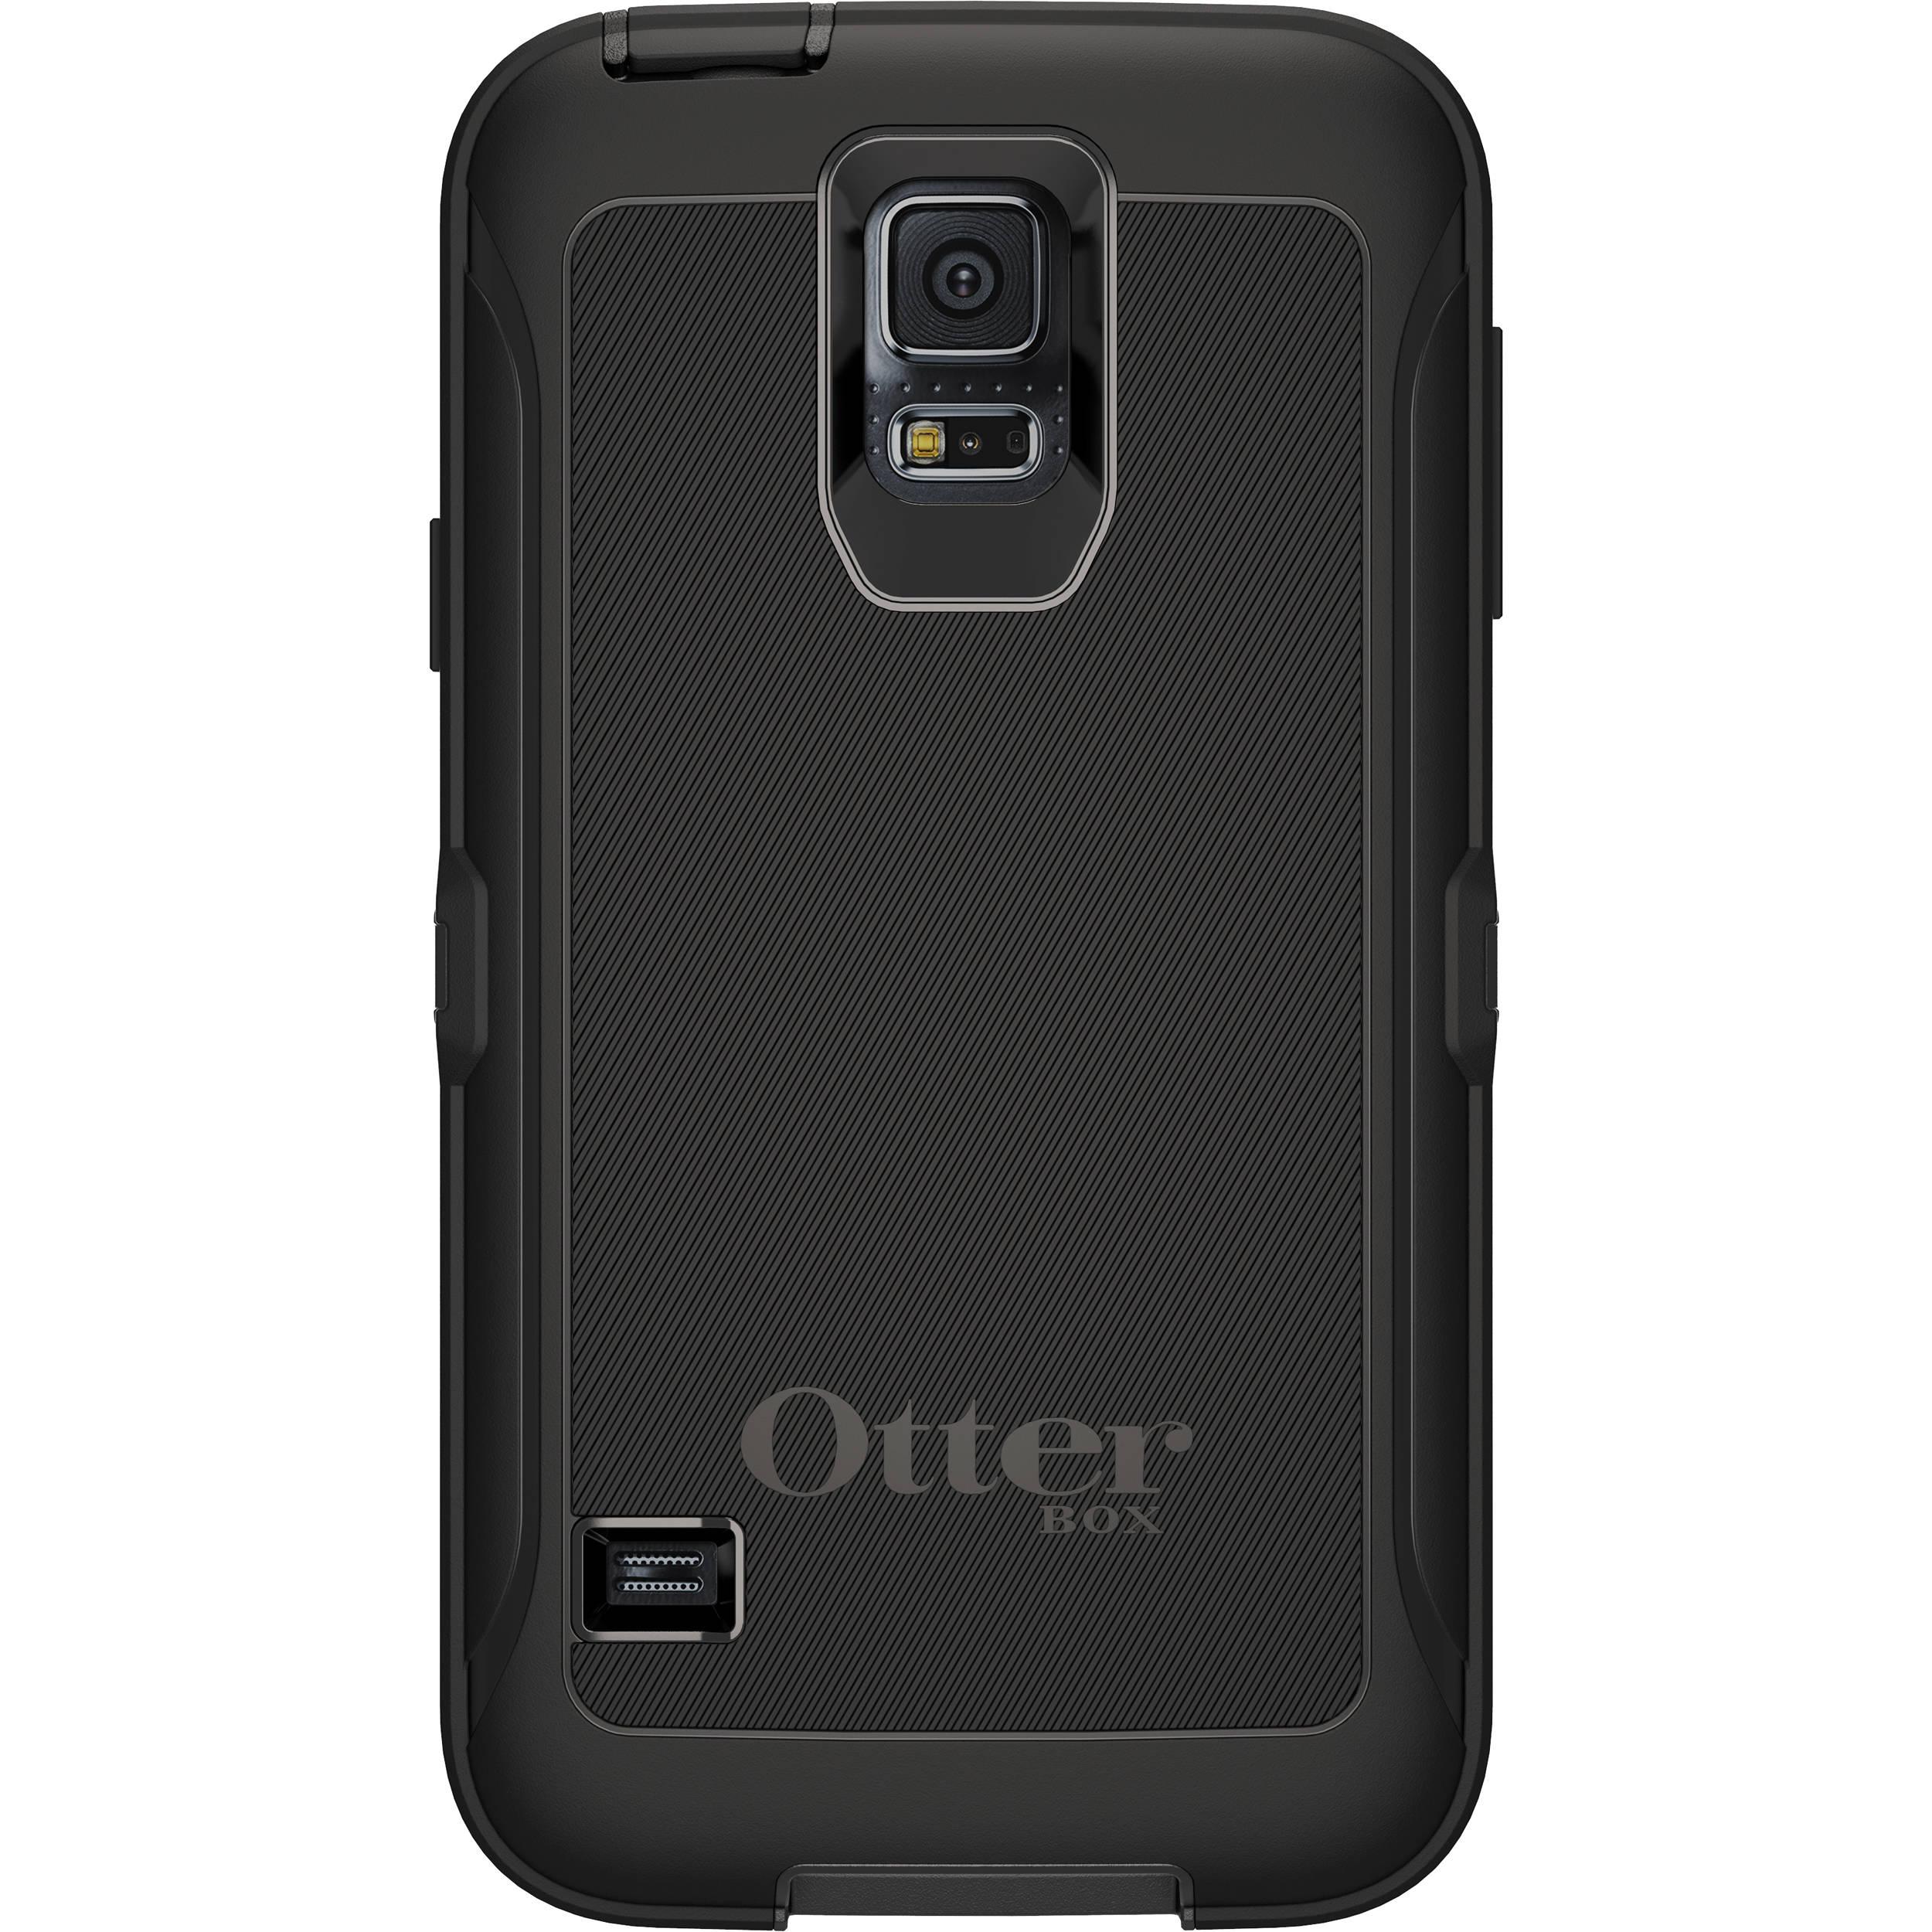 Otter Box Defender Case for Galaxy S5 (Black) 77-38796 Bu0026H Photo